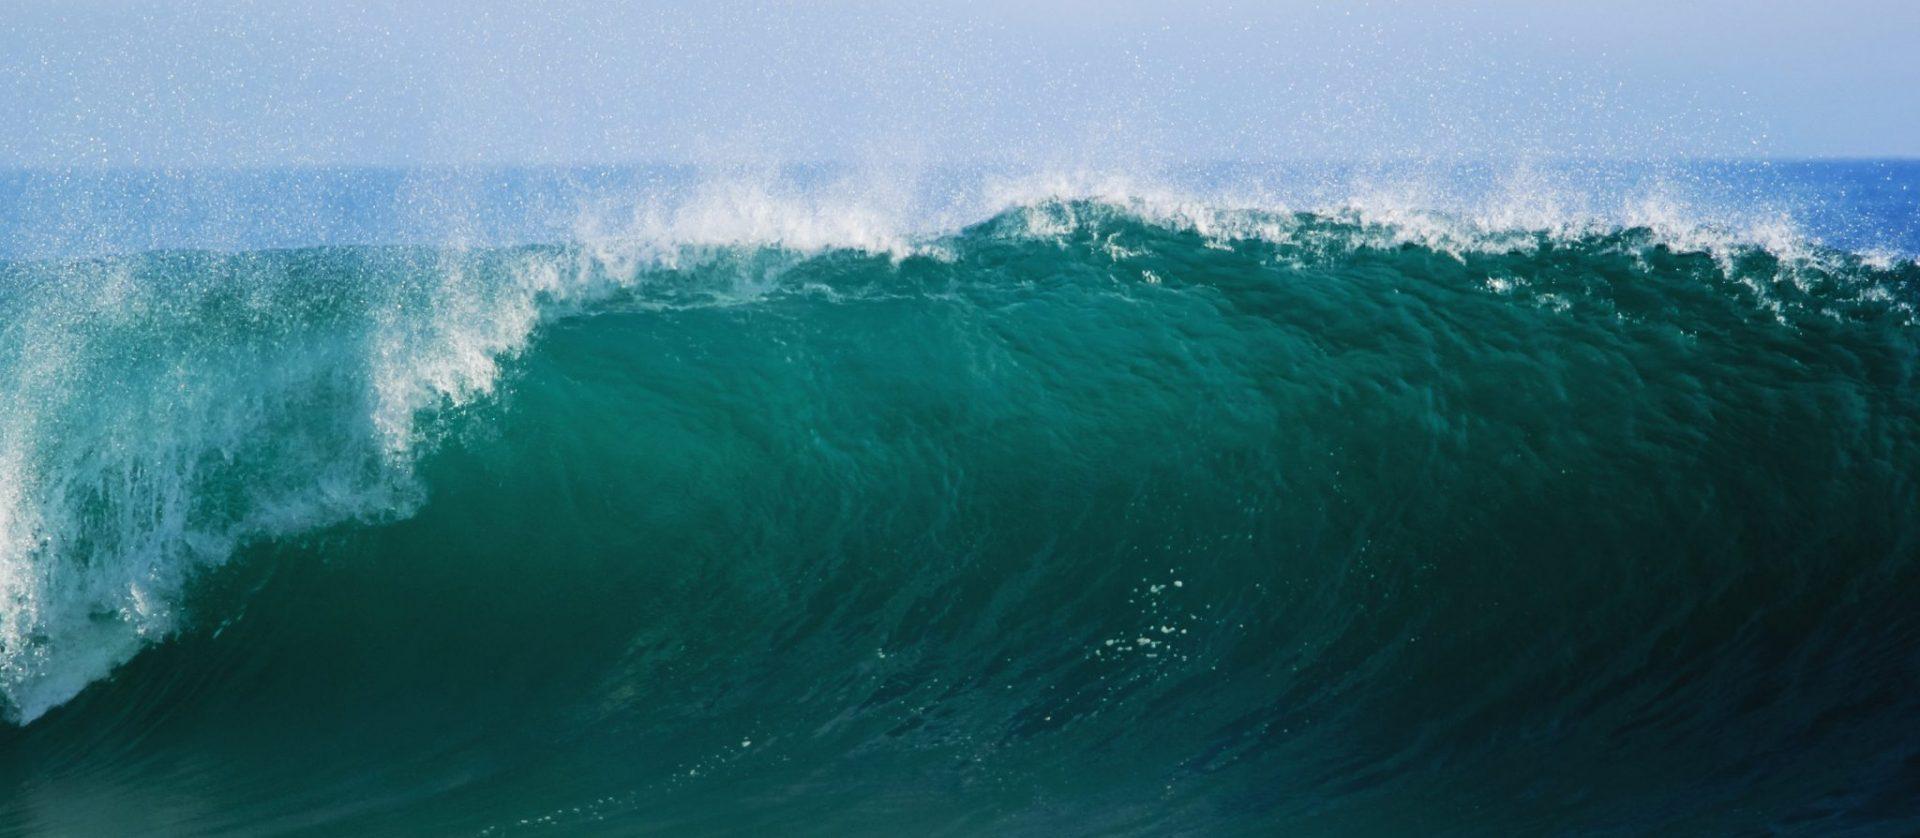 Boulder clipart ocean. Inland coalition